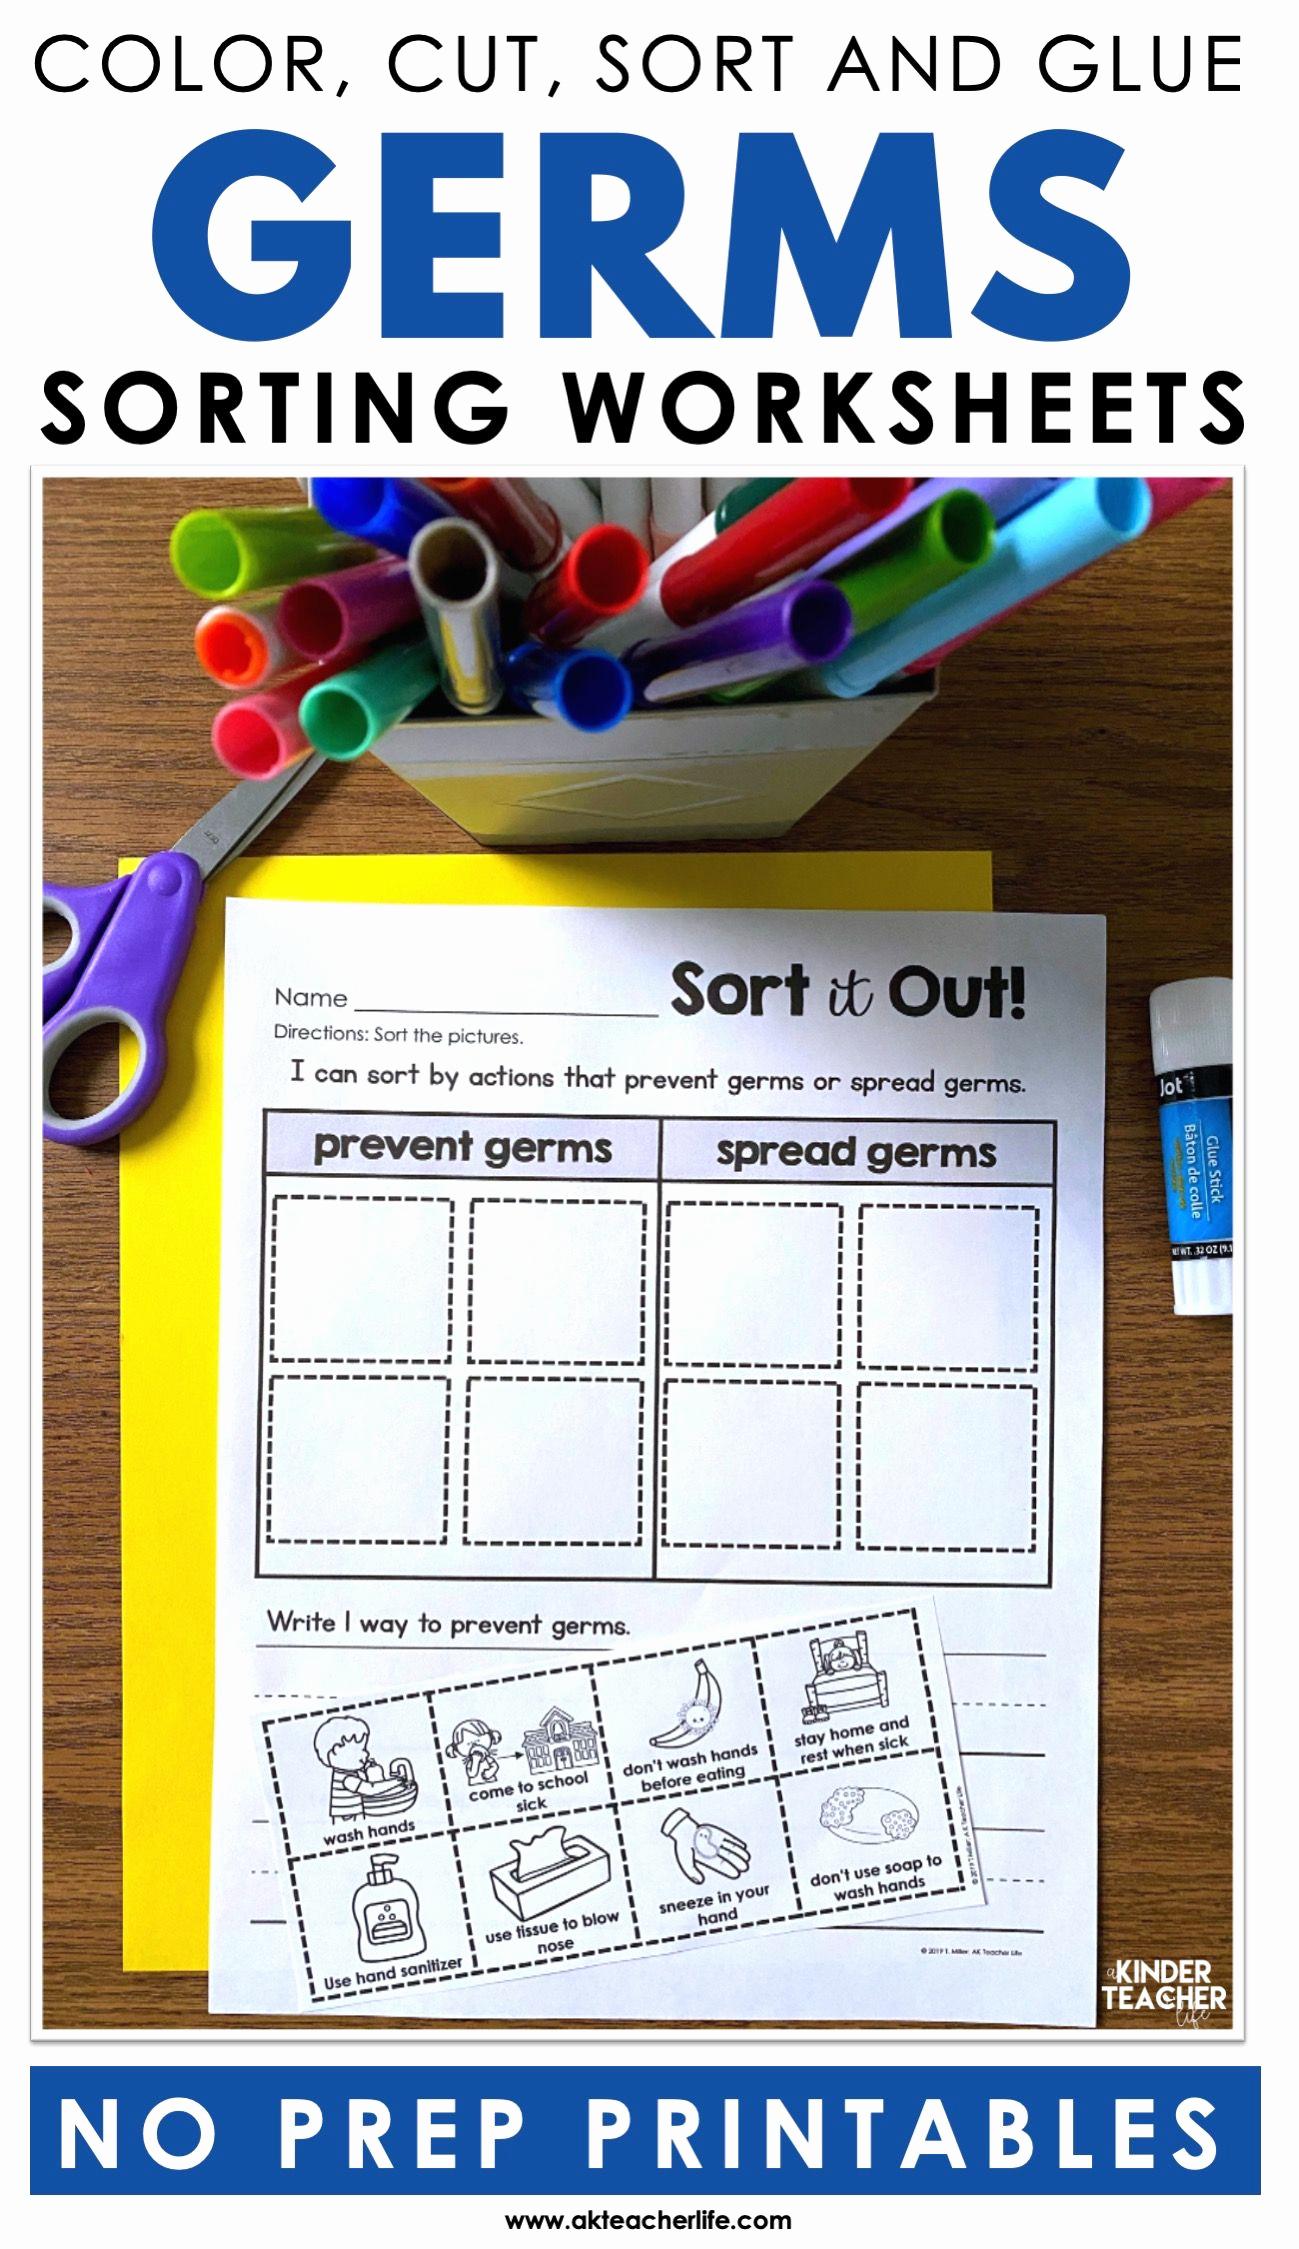 Germs Worksheets for Kindergarten Luxury Germs sort